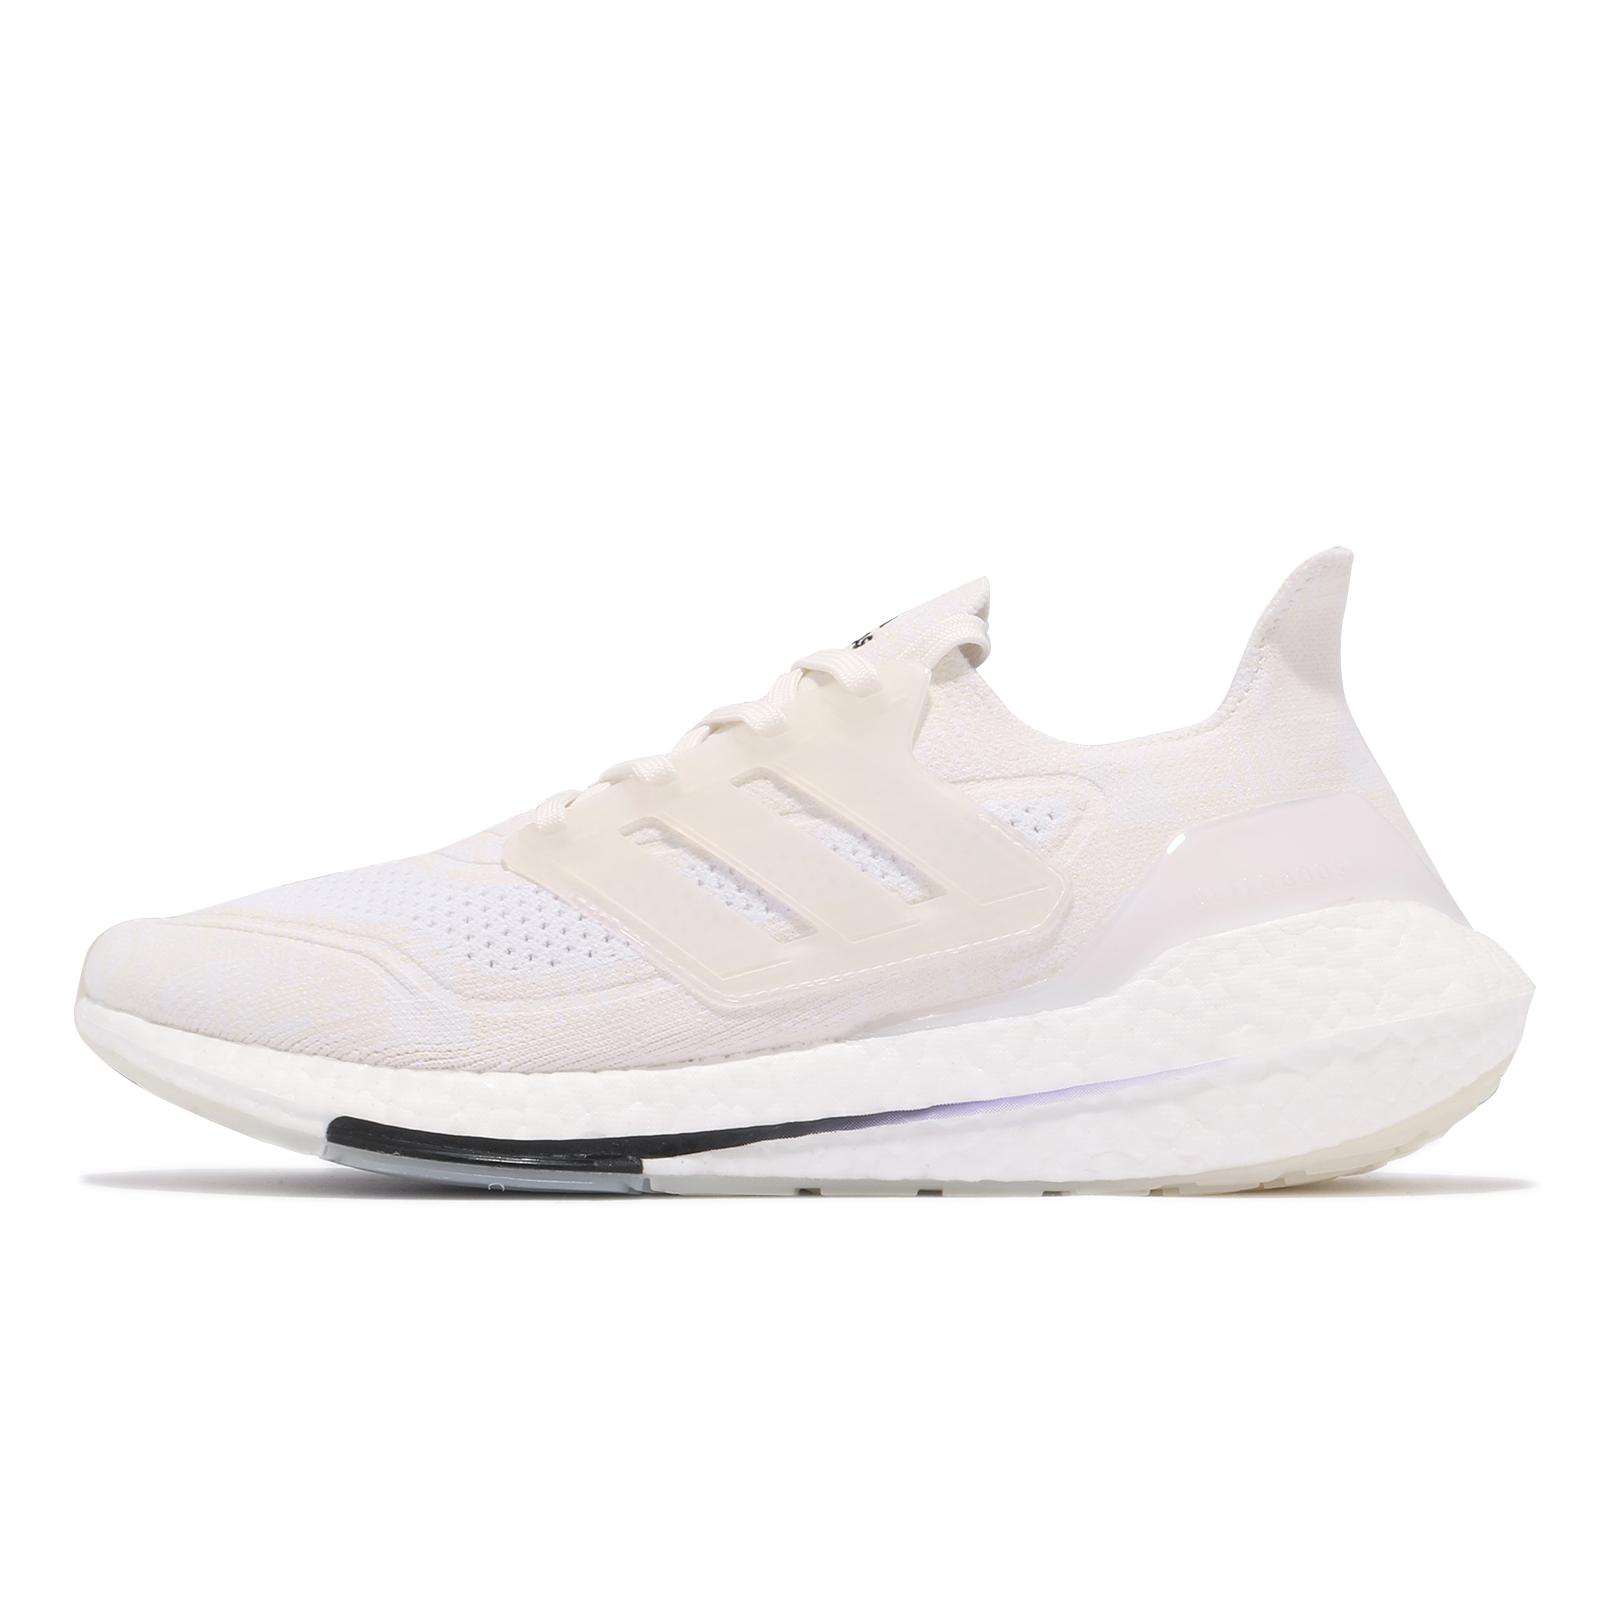 adidas 慢跑鞋 Ultraboost 21 Primeblue 全白 白 男鞋 愛迪達 路跑 ACS FY0836